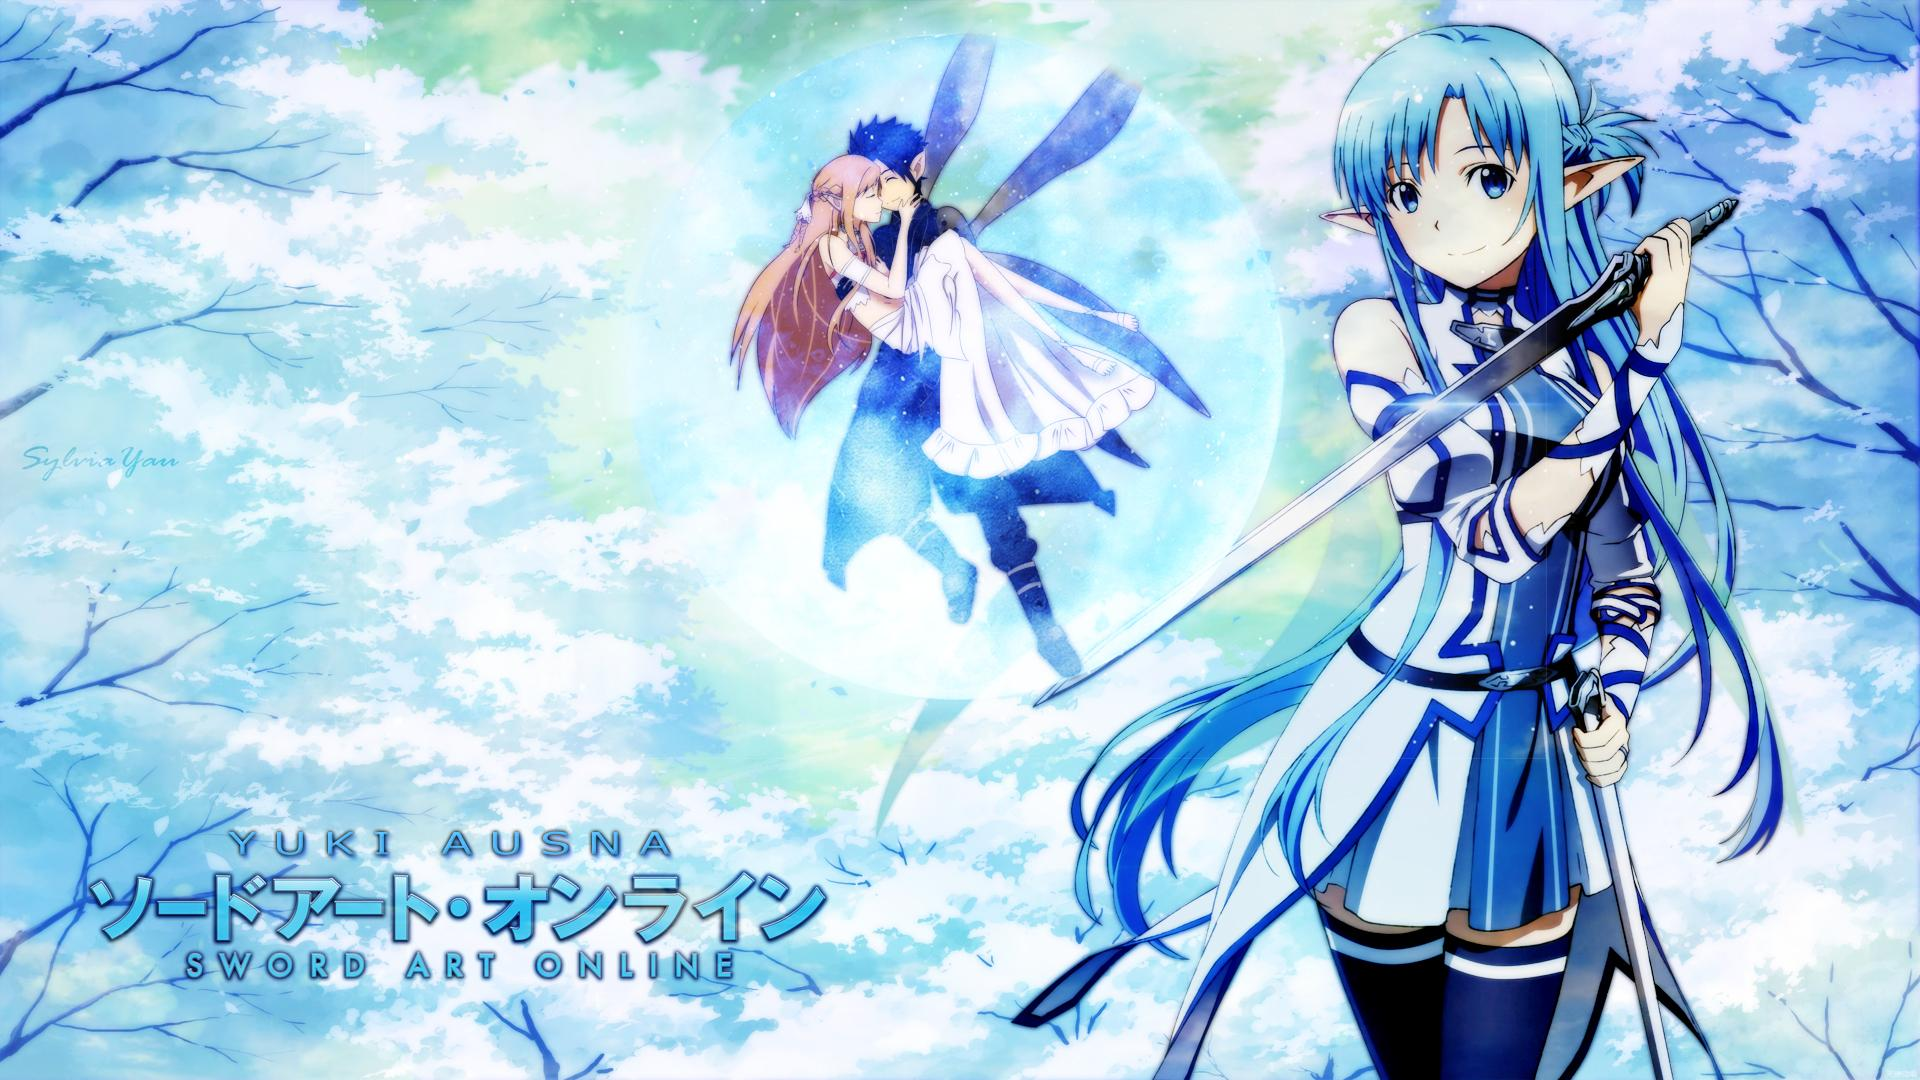 Wallpaper Sword Art Online Asuna und Yuuki by Asukij on